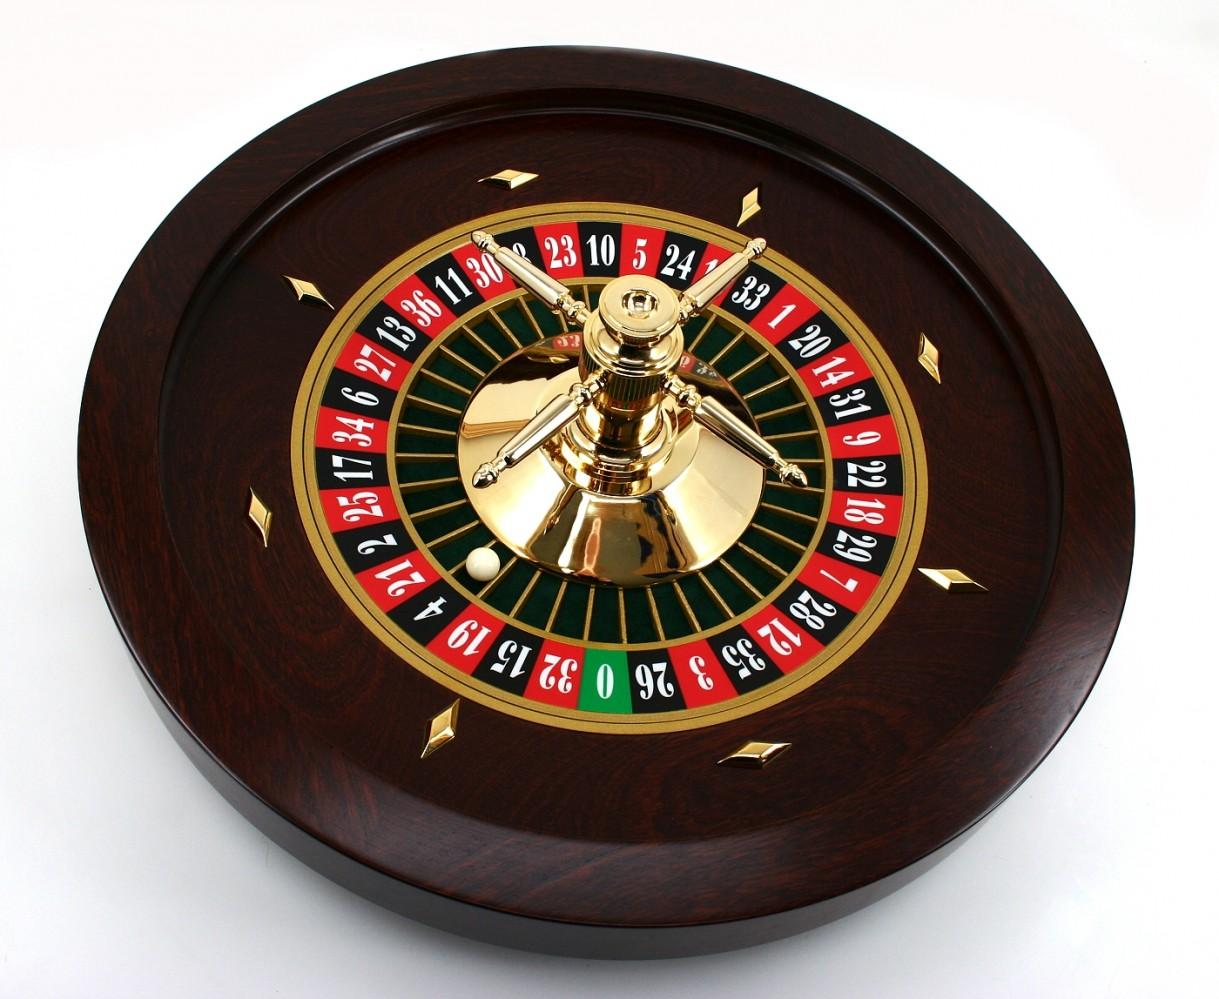 europa casino online play